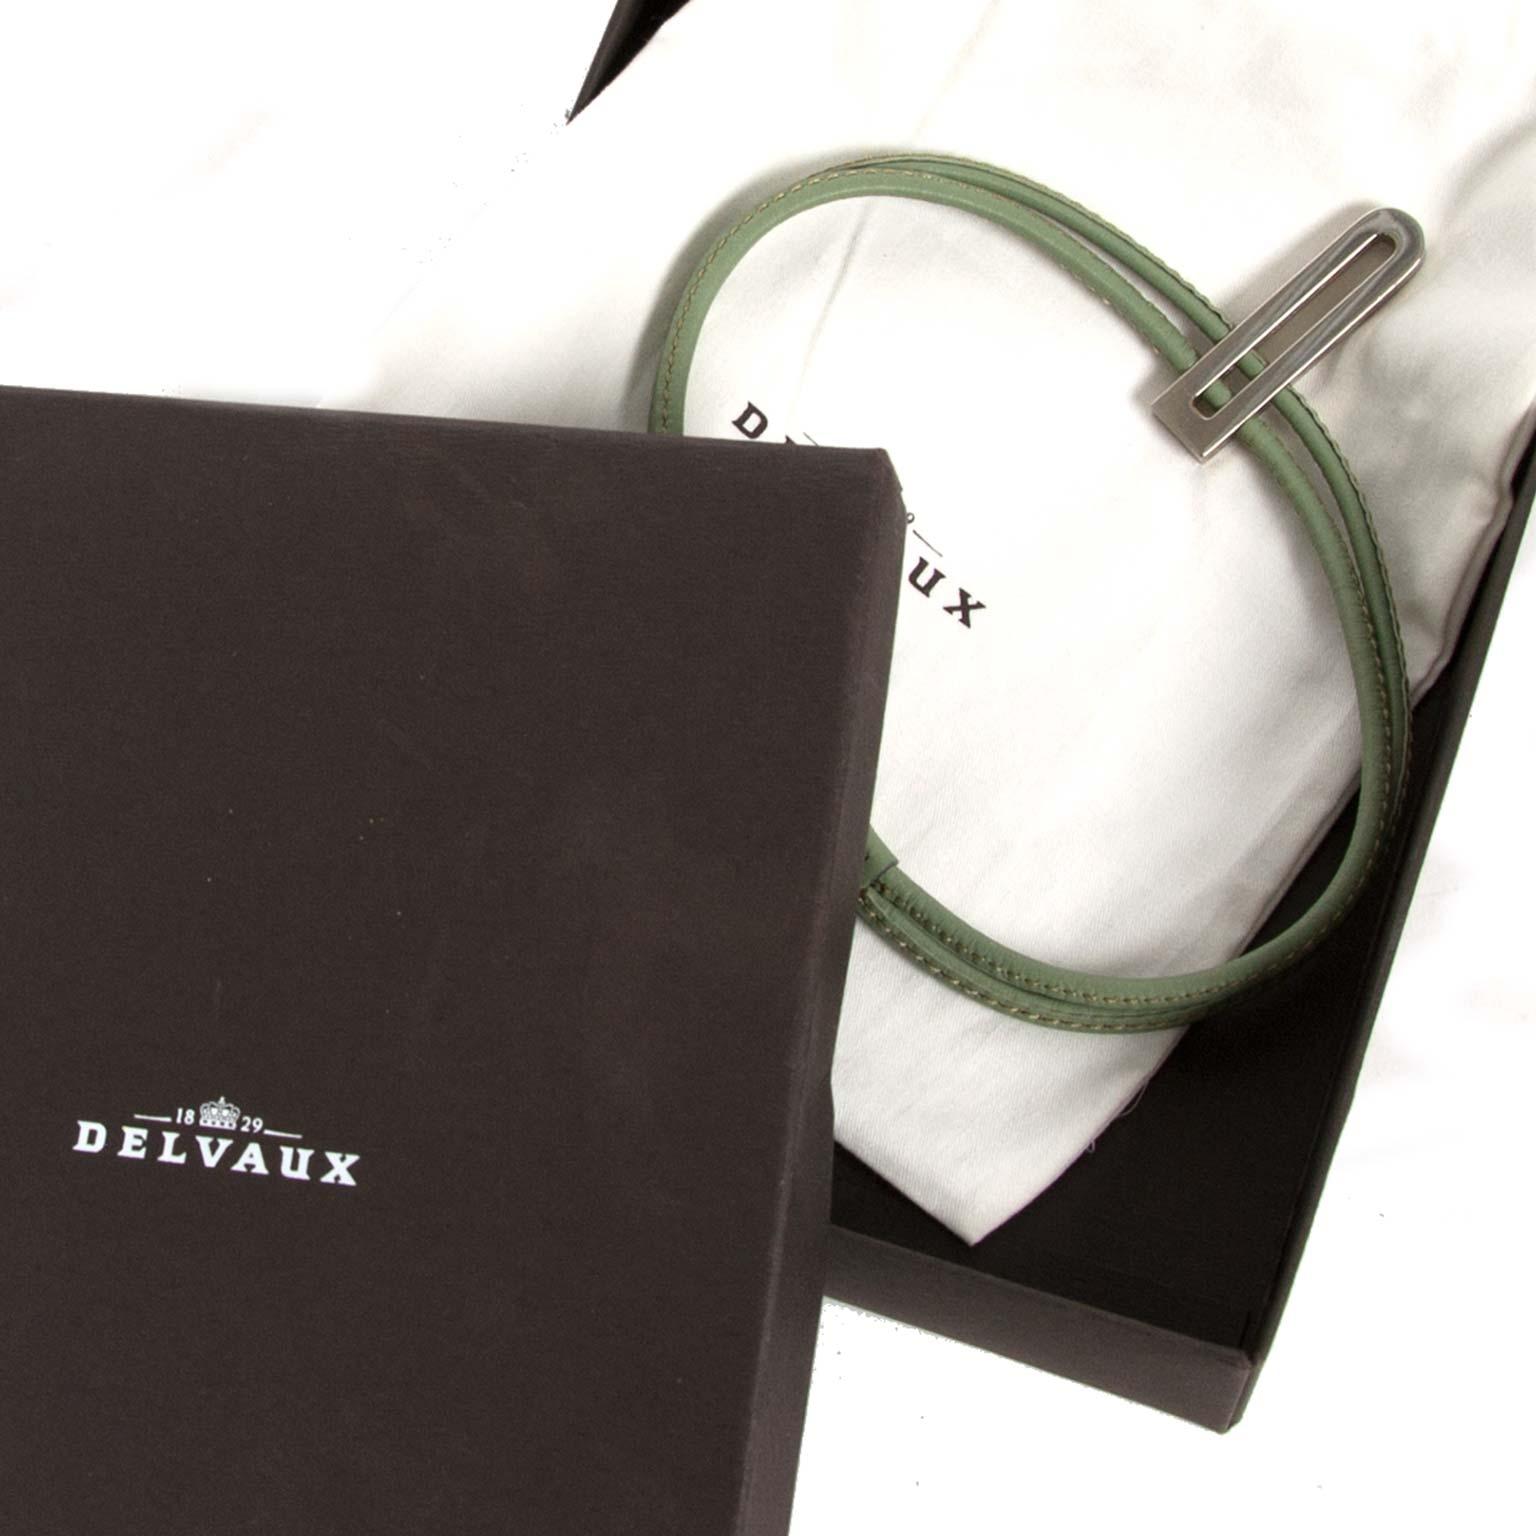 delvaux green d leather necklace now for sale at labellov vintage fashion webshop belgium